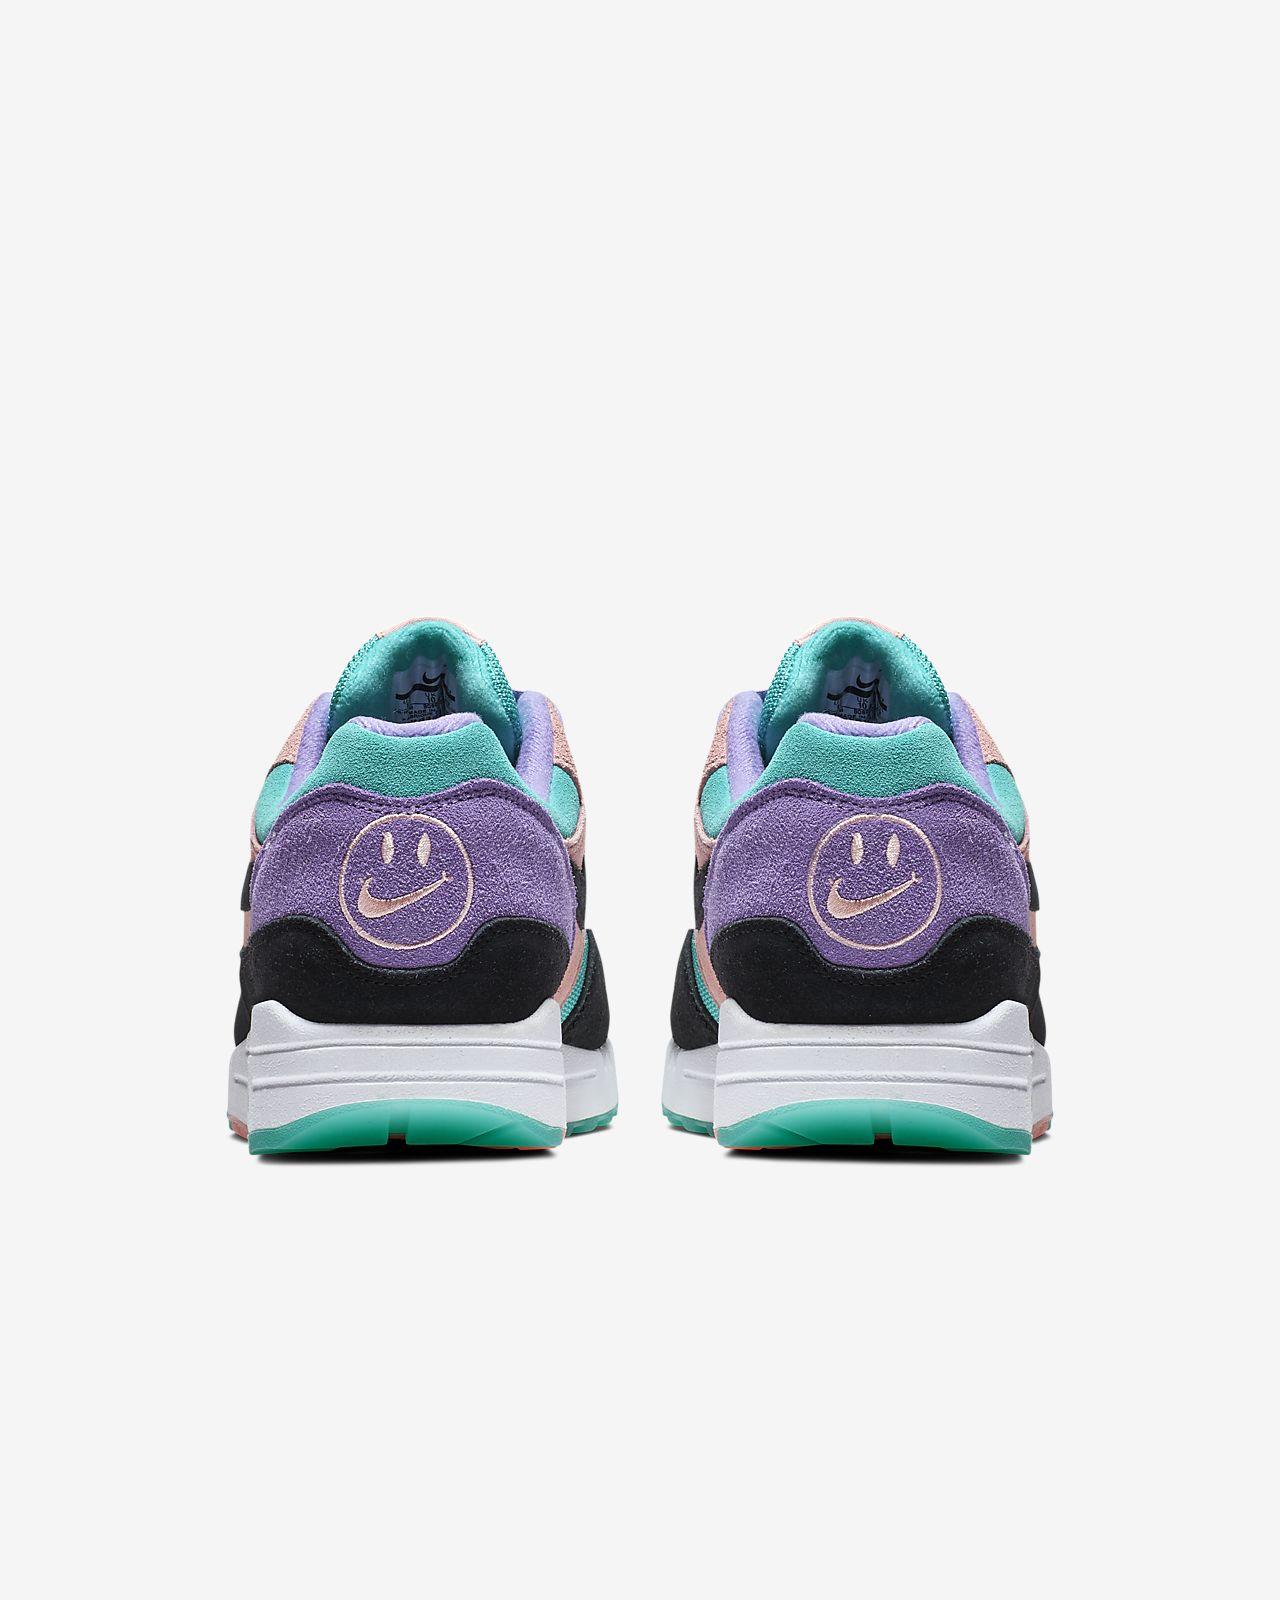 quality design 48a79 d4050 ... Nike Air Max 1 ND Men s Shoe